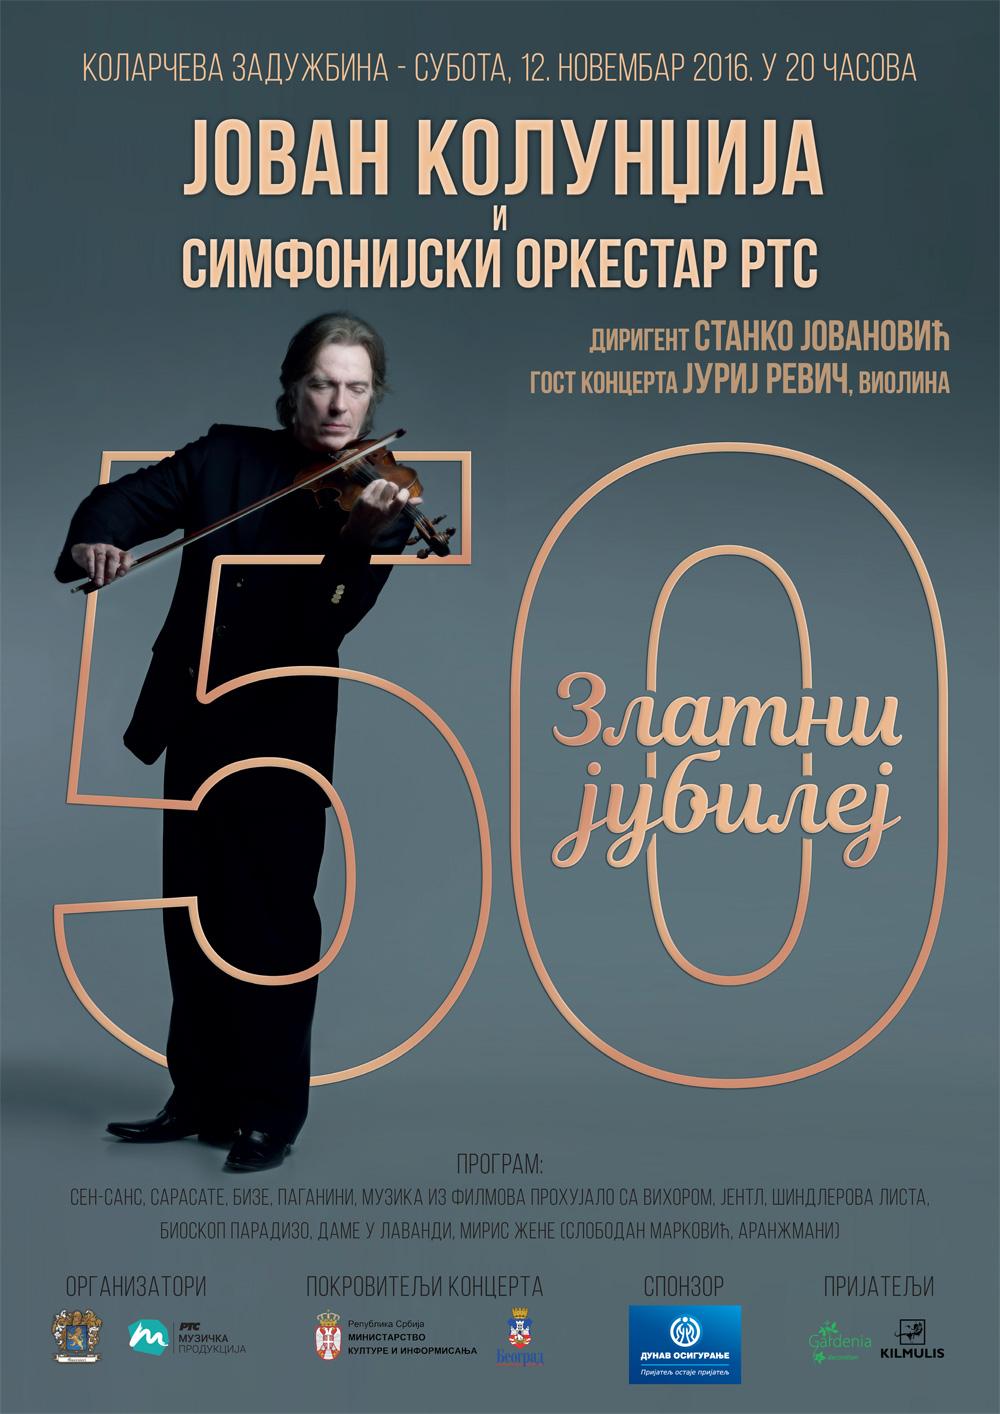 Kilmulis design - Jovan Kolundzija - poster 2016 03